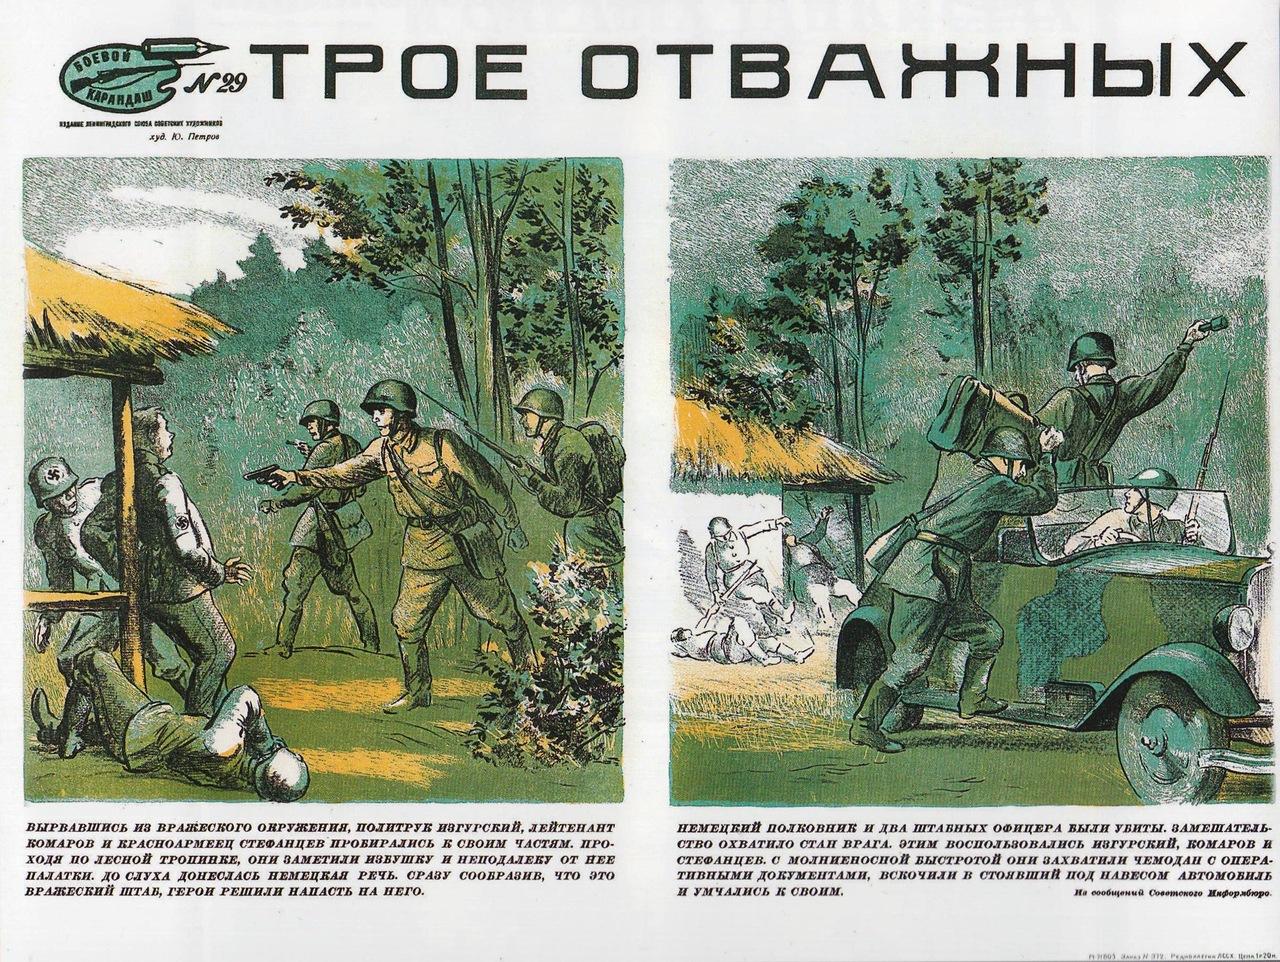 http://propagandahistory.ru/pics/2014/01/1390139611_06f0.jpg height=960 height=627